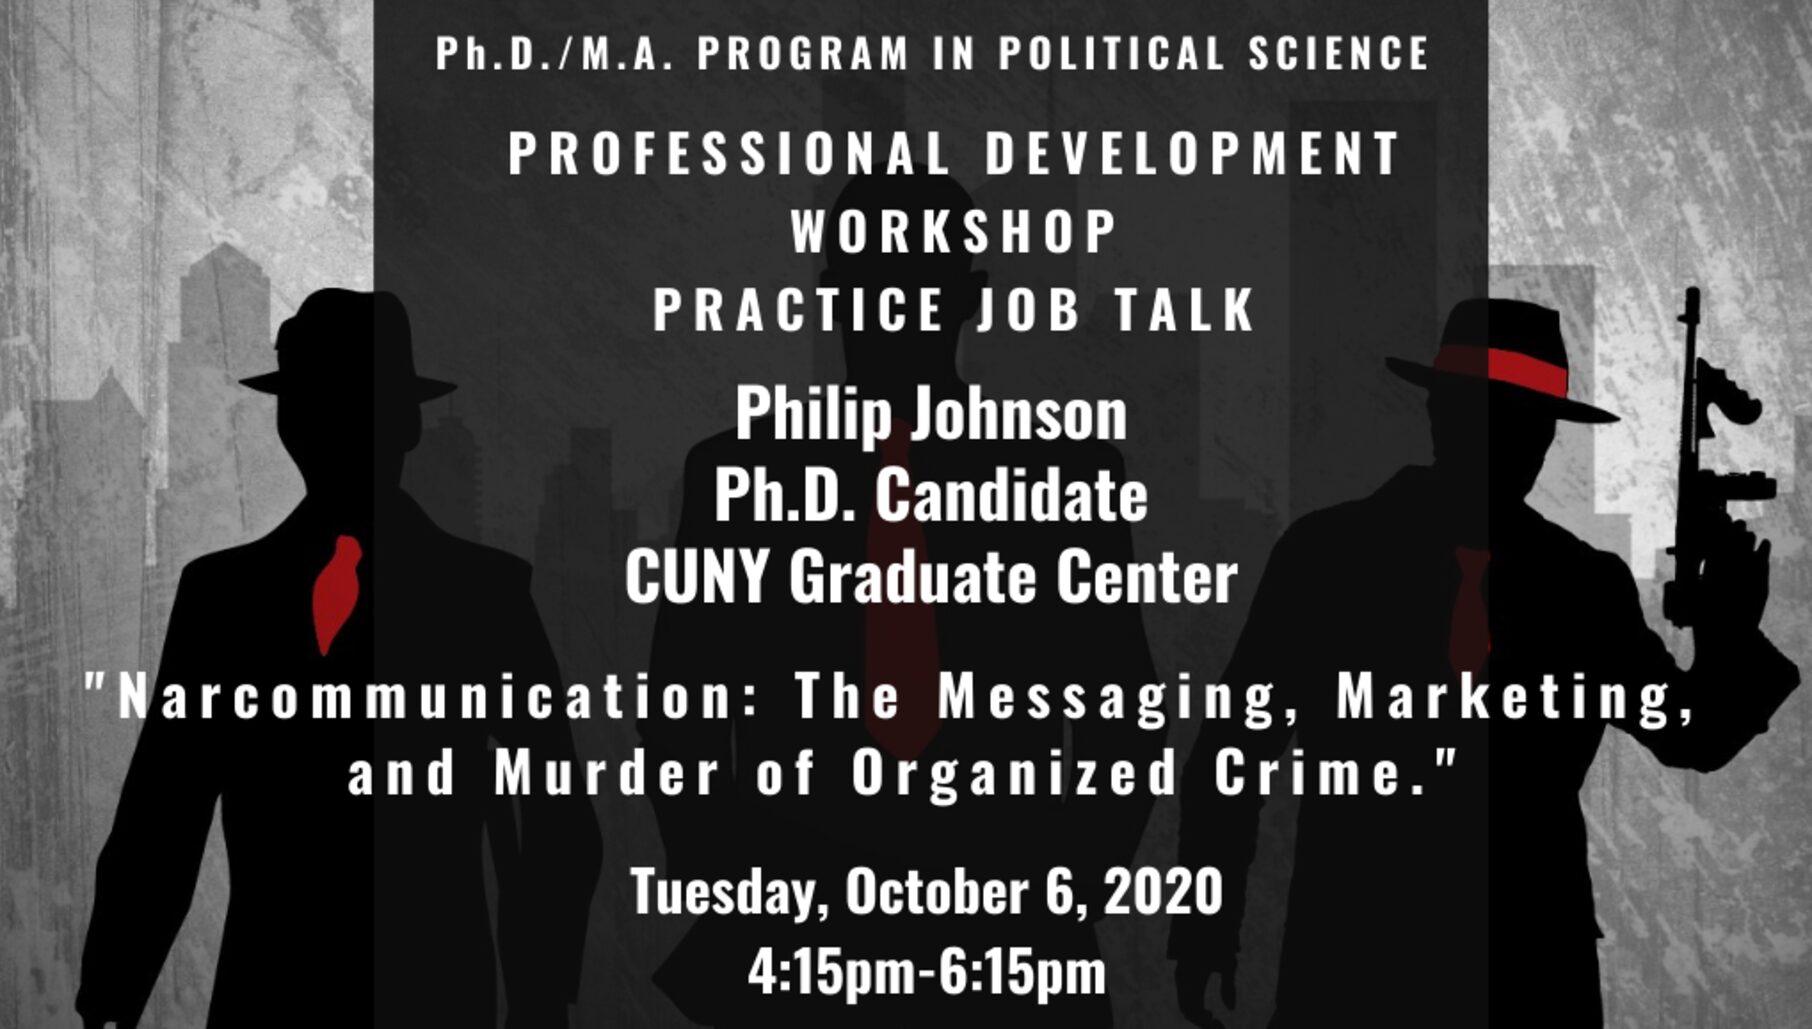 Professional Development Workshop: Practice Job Talk, Philip Johnson, Tuesday, October 6, 4:15PM